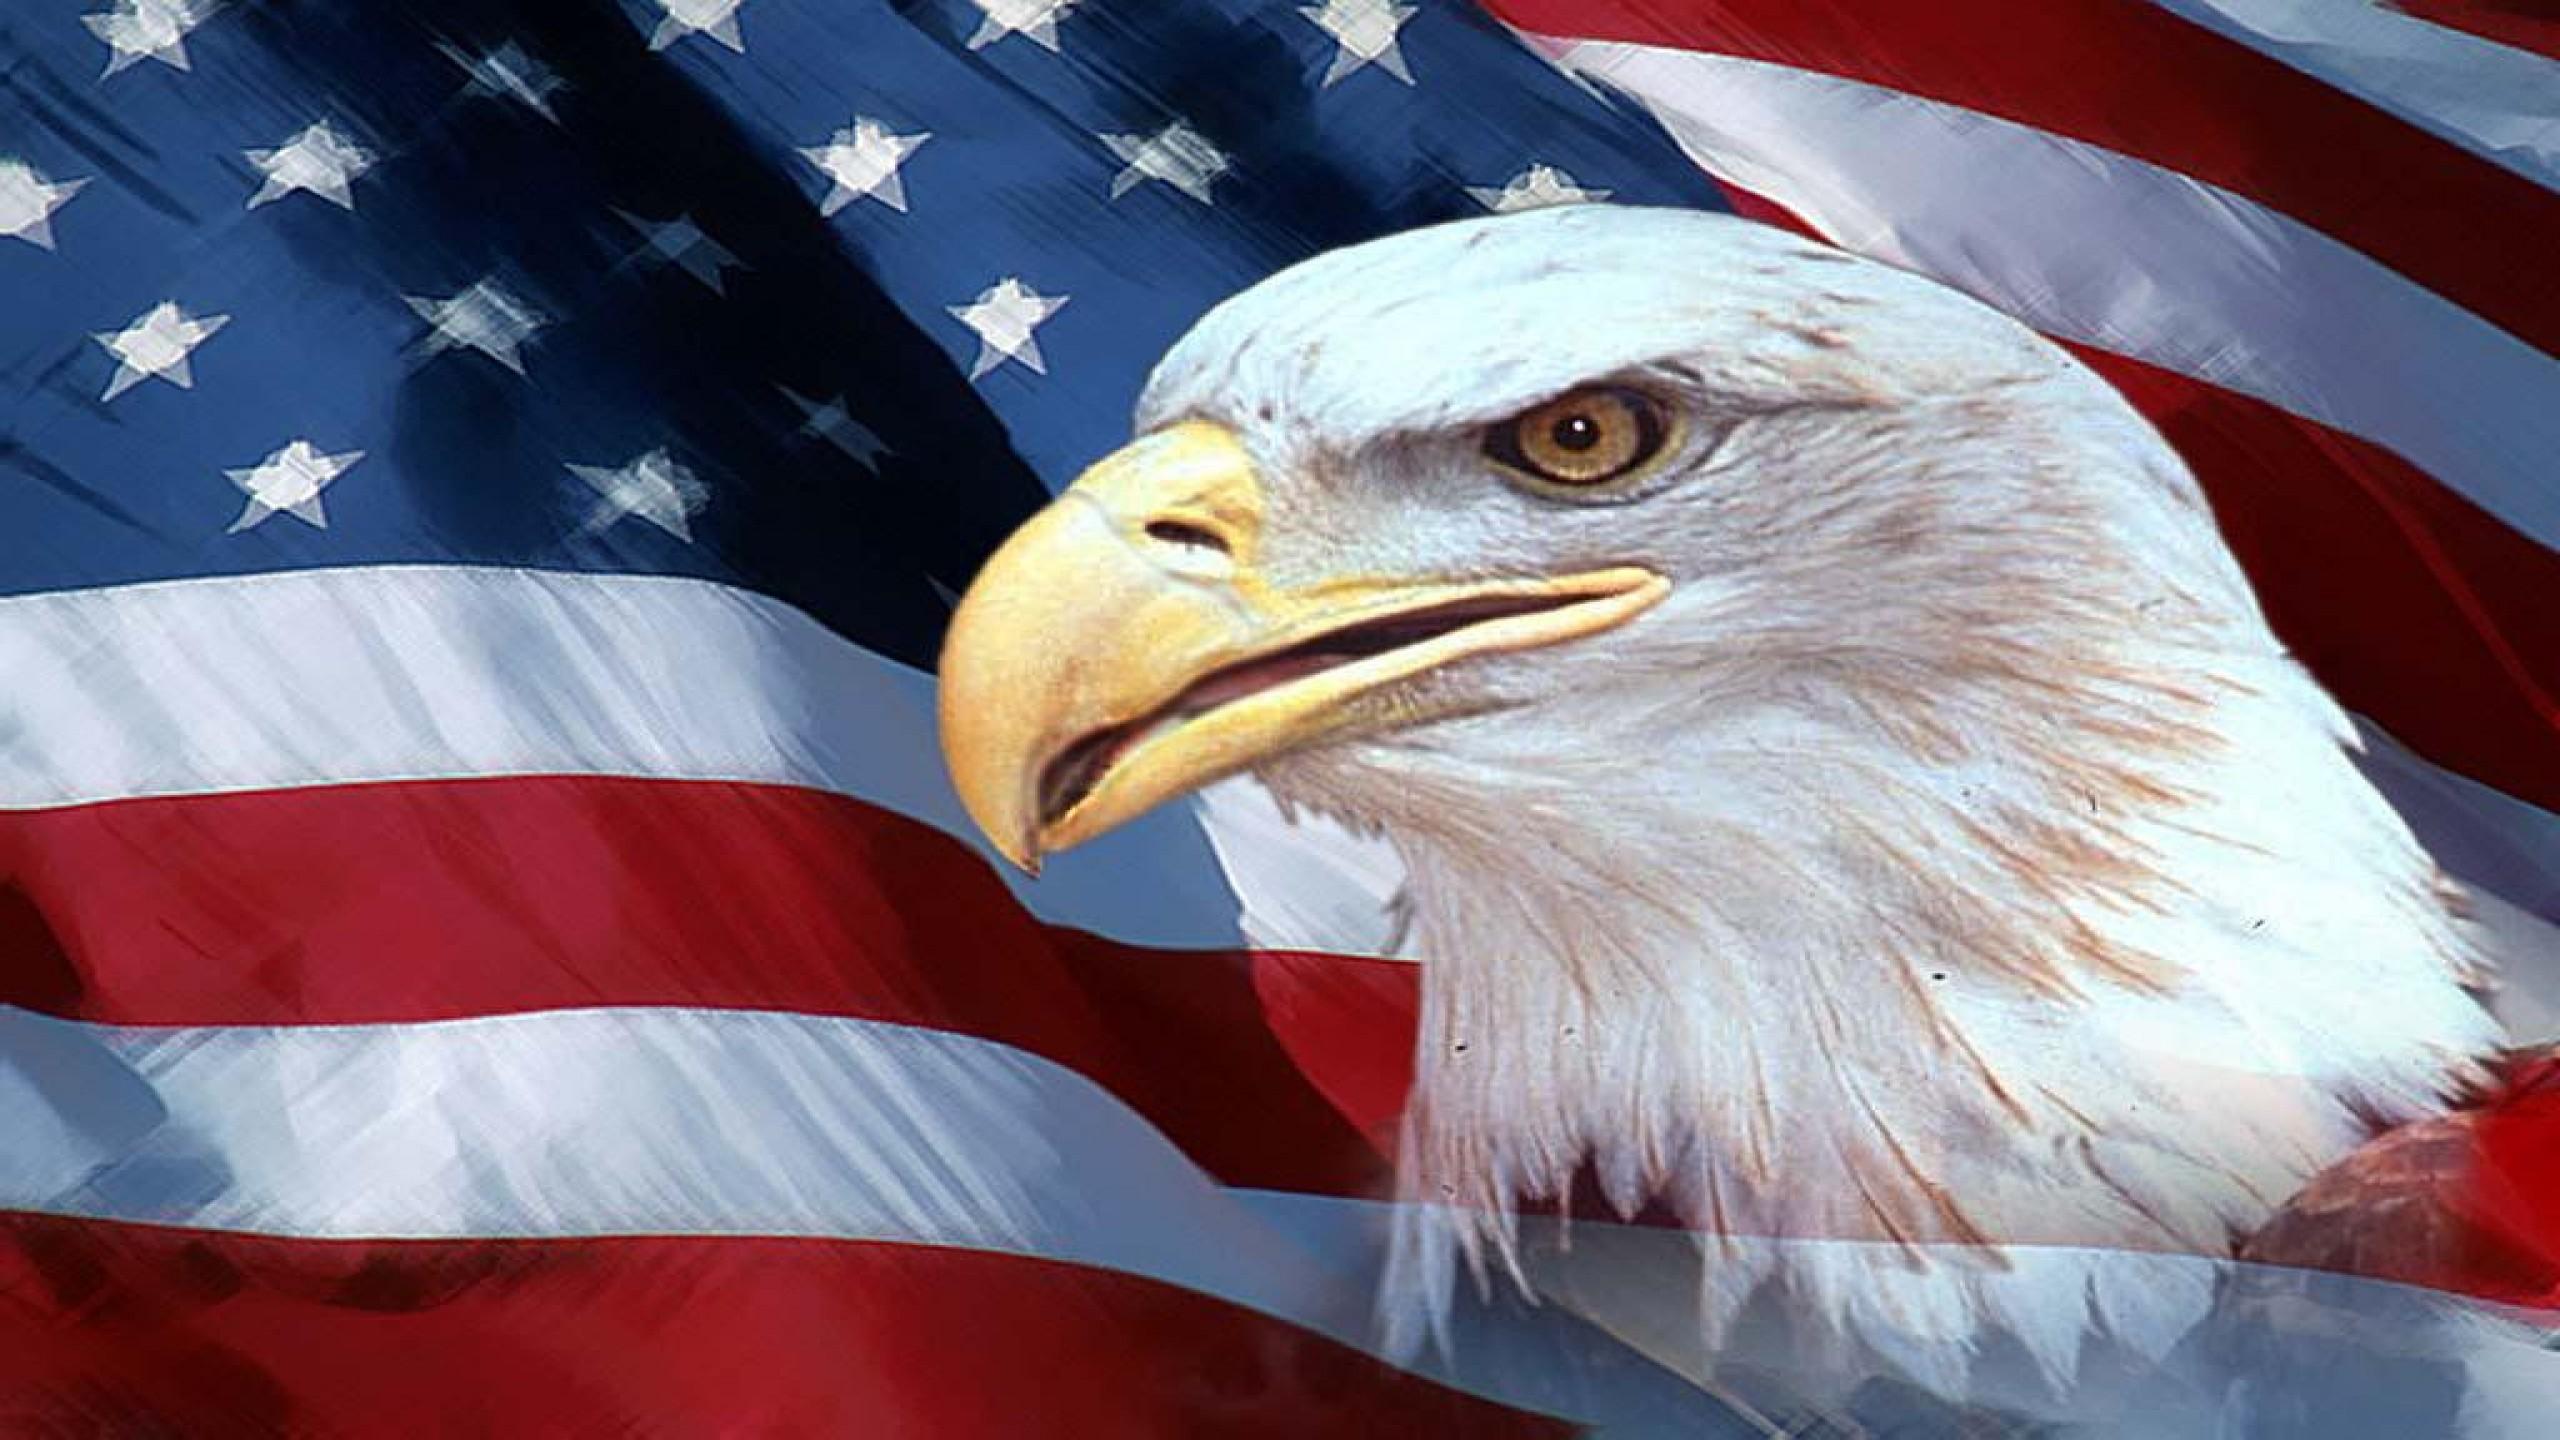 american flag wallpaper 1024x768 eagle 2560x1440